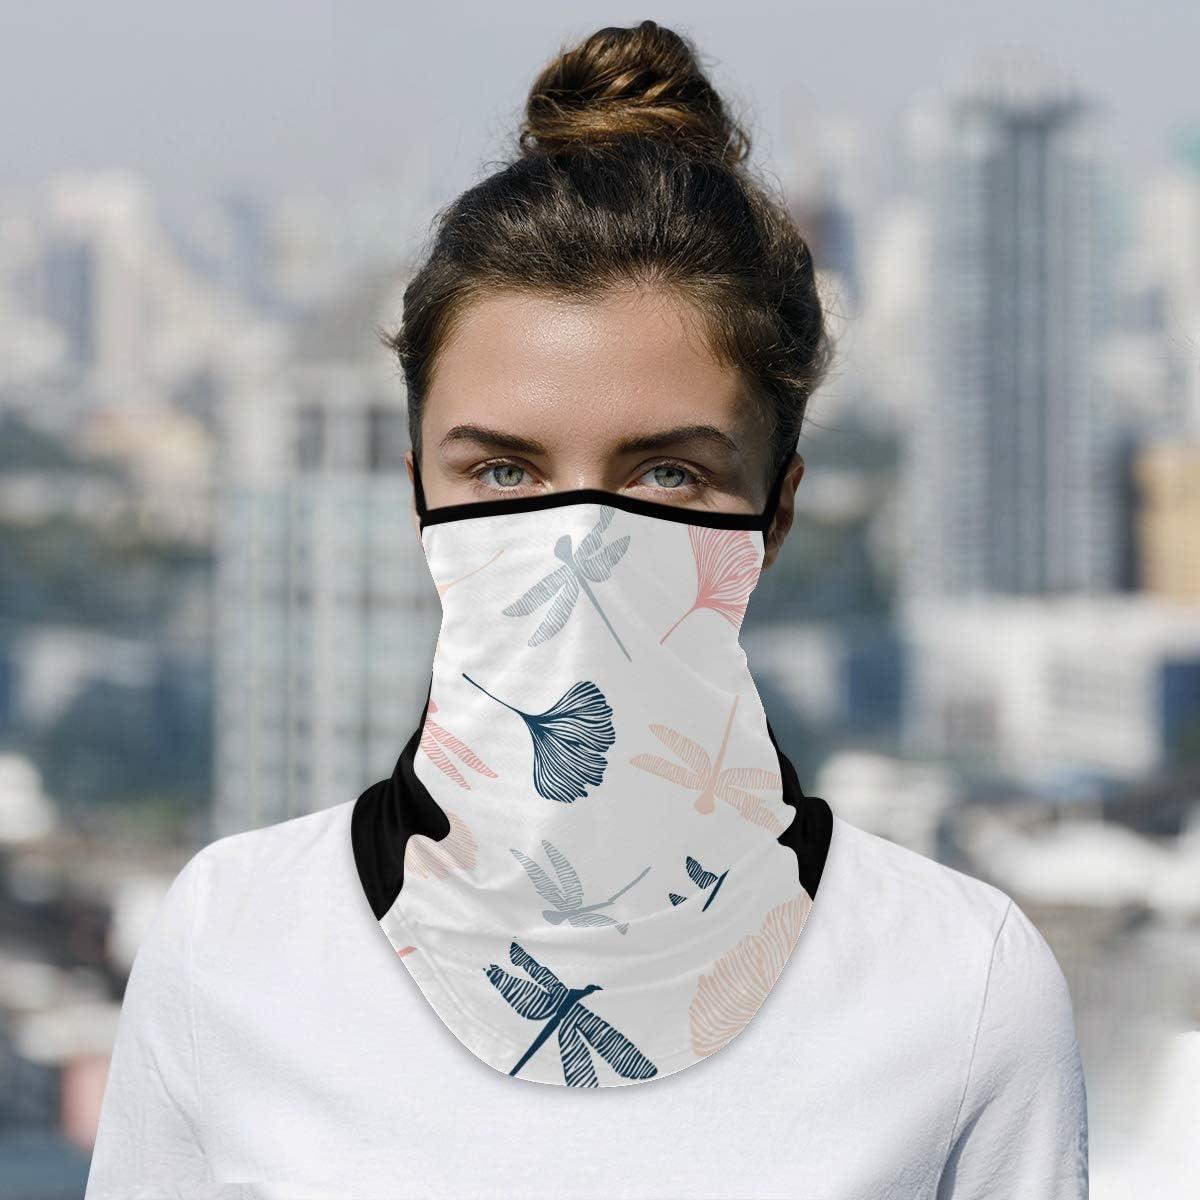 DAOXIANG Animal Dragonfly Multifunctional Ice Face Mask Silk San Antonio Mall Ne supreme